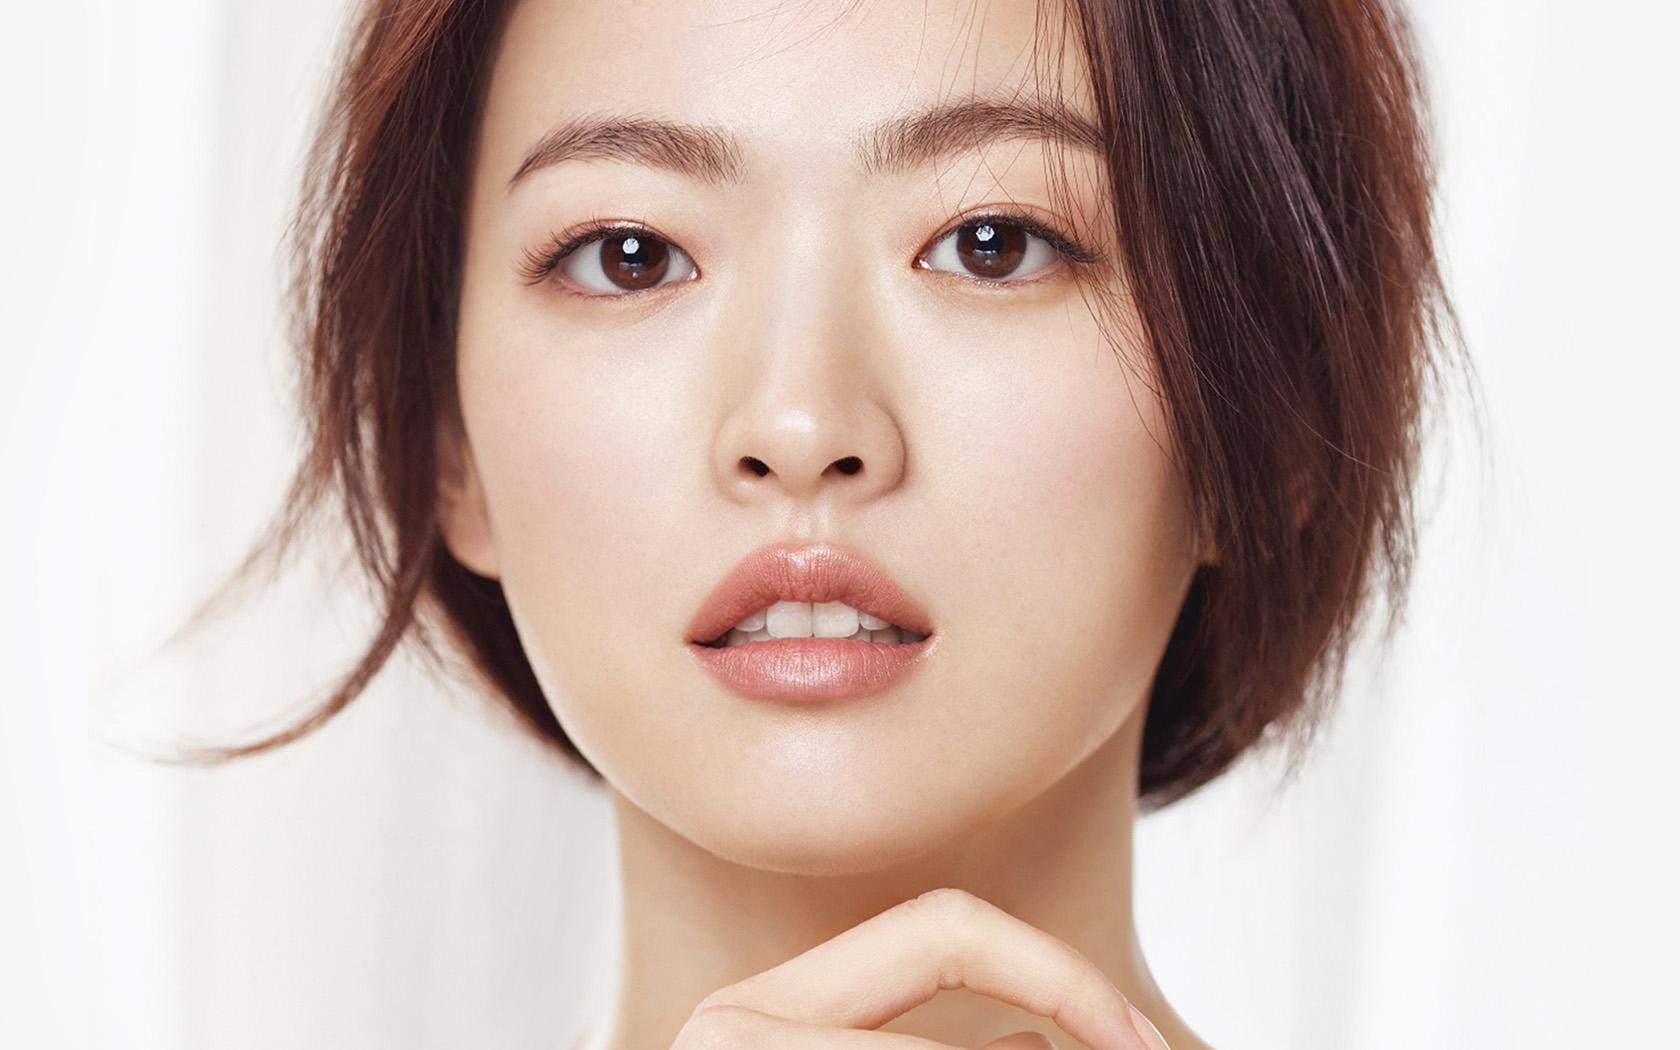 4k Fall Painting Wallpapers Hi49 Kpop Asian Girl Face Beauty Wallpaper